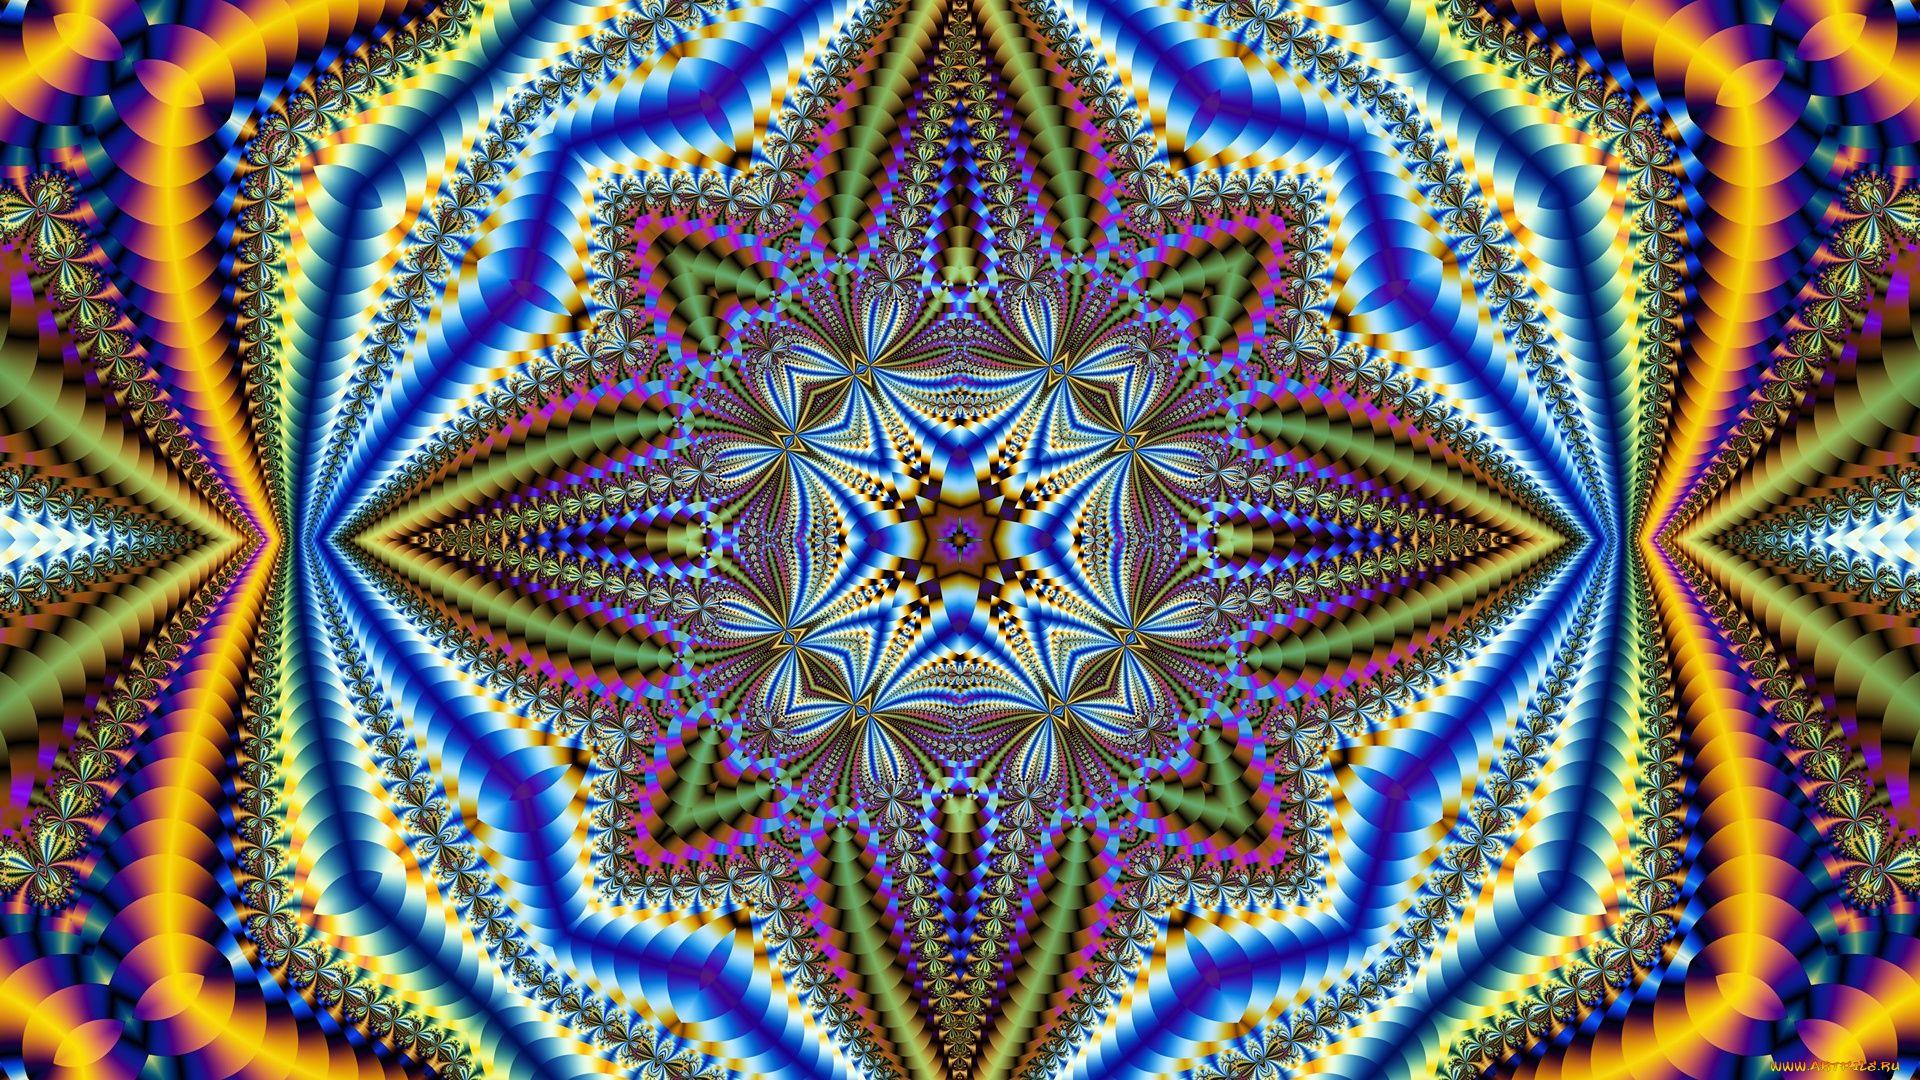 Kaleidoscope computer wallpaper